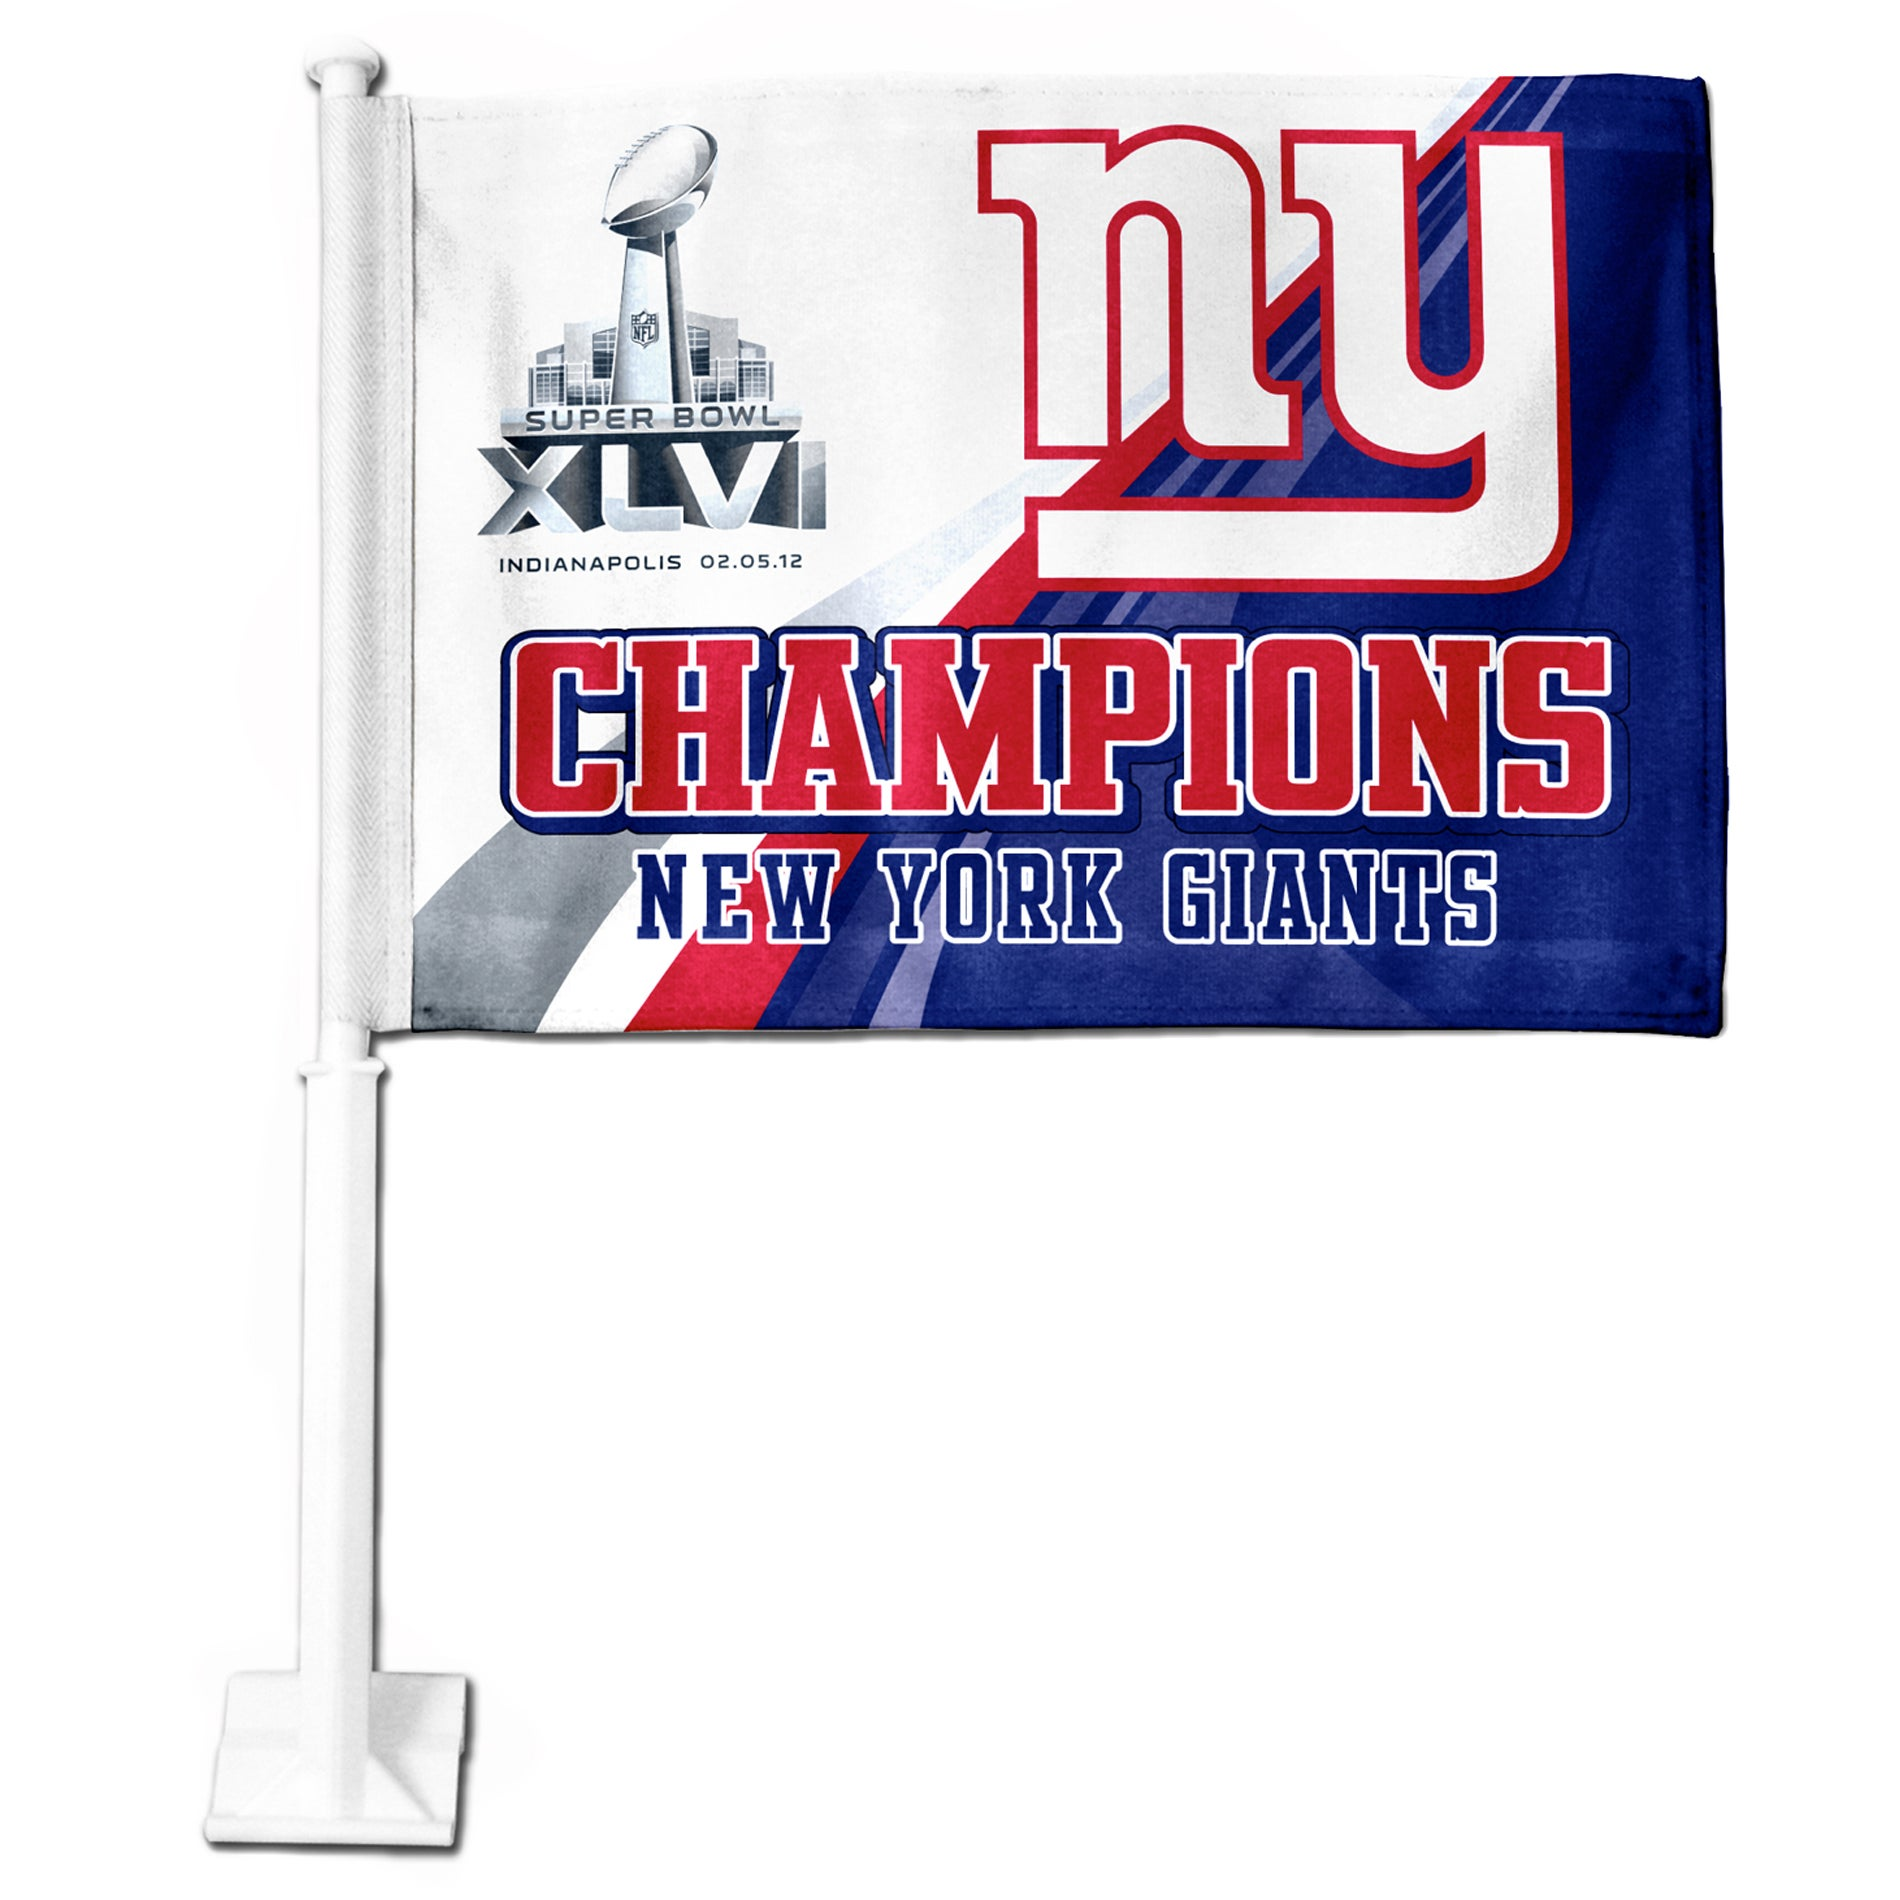 New York Giants Super Bowl XLVI Champion Car Flag